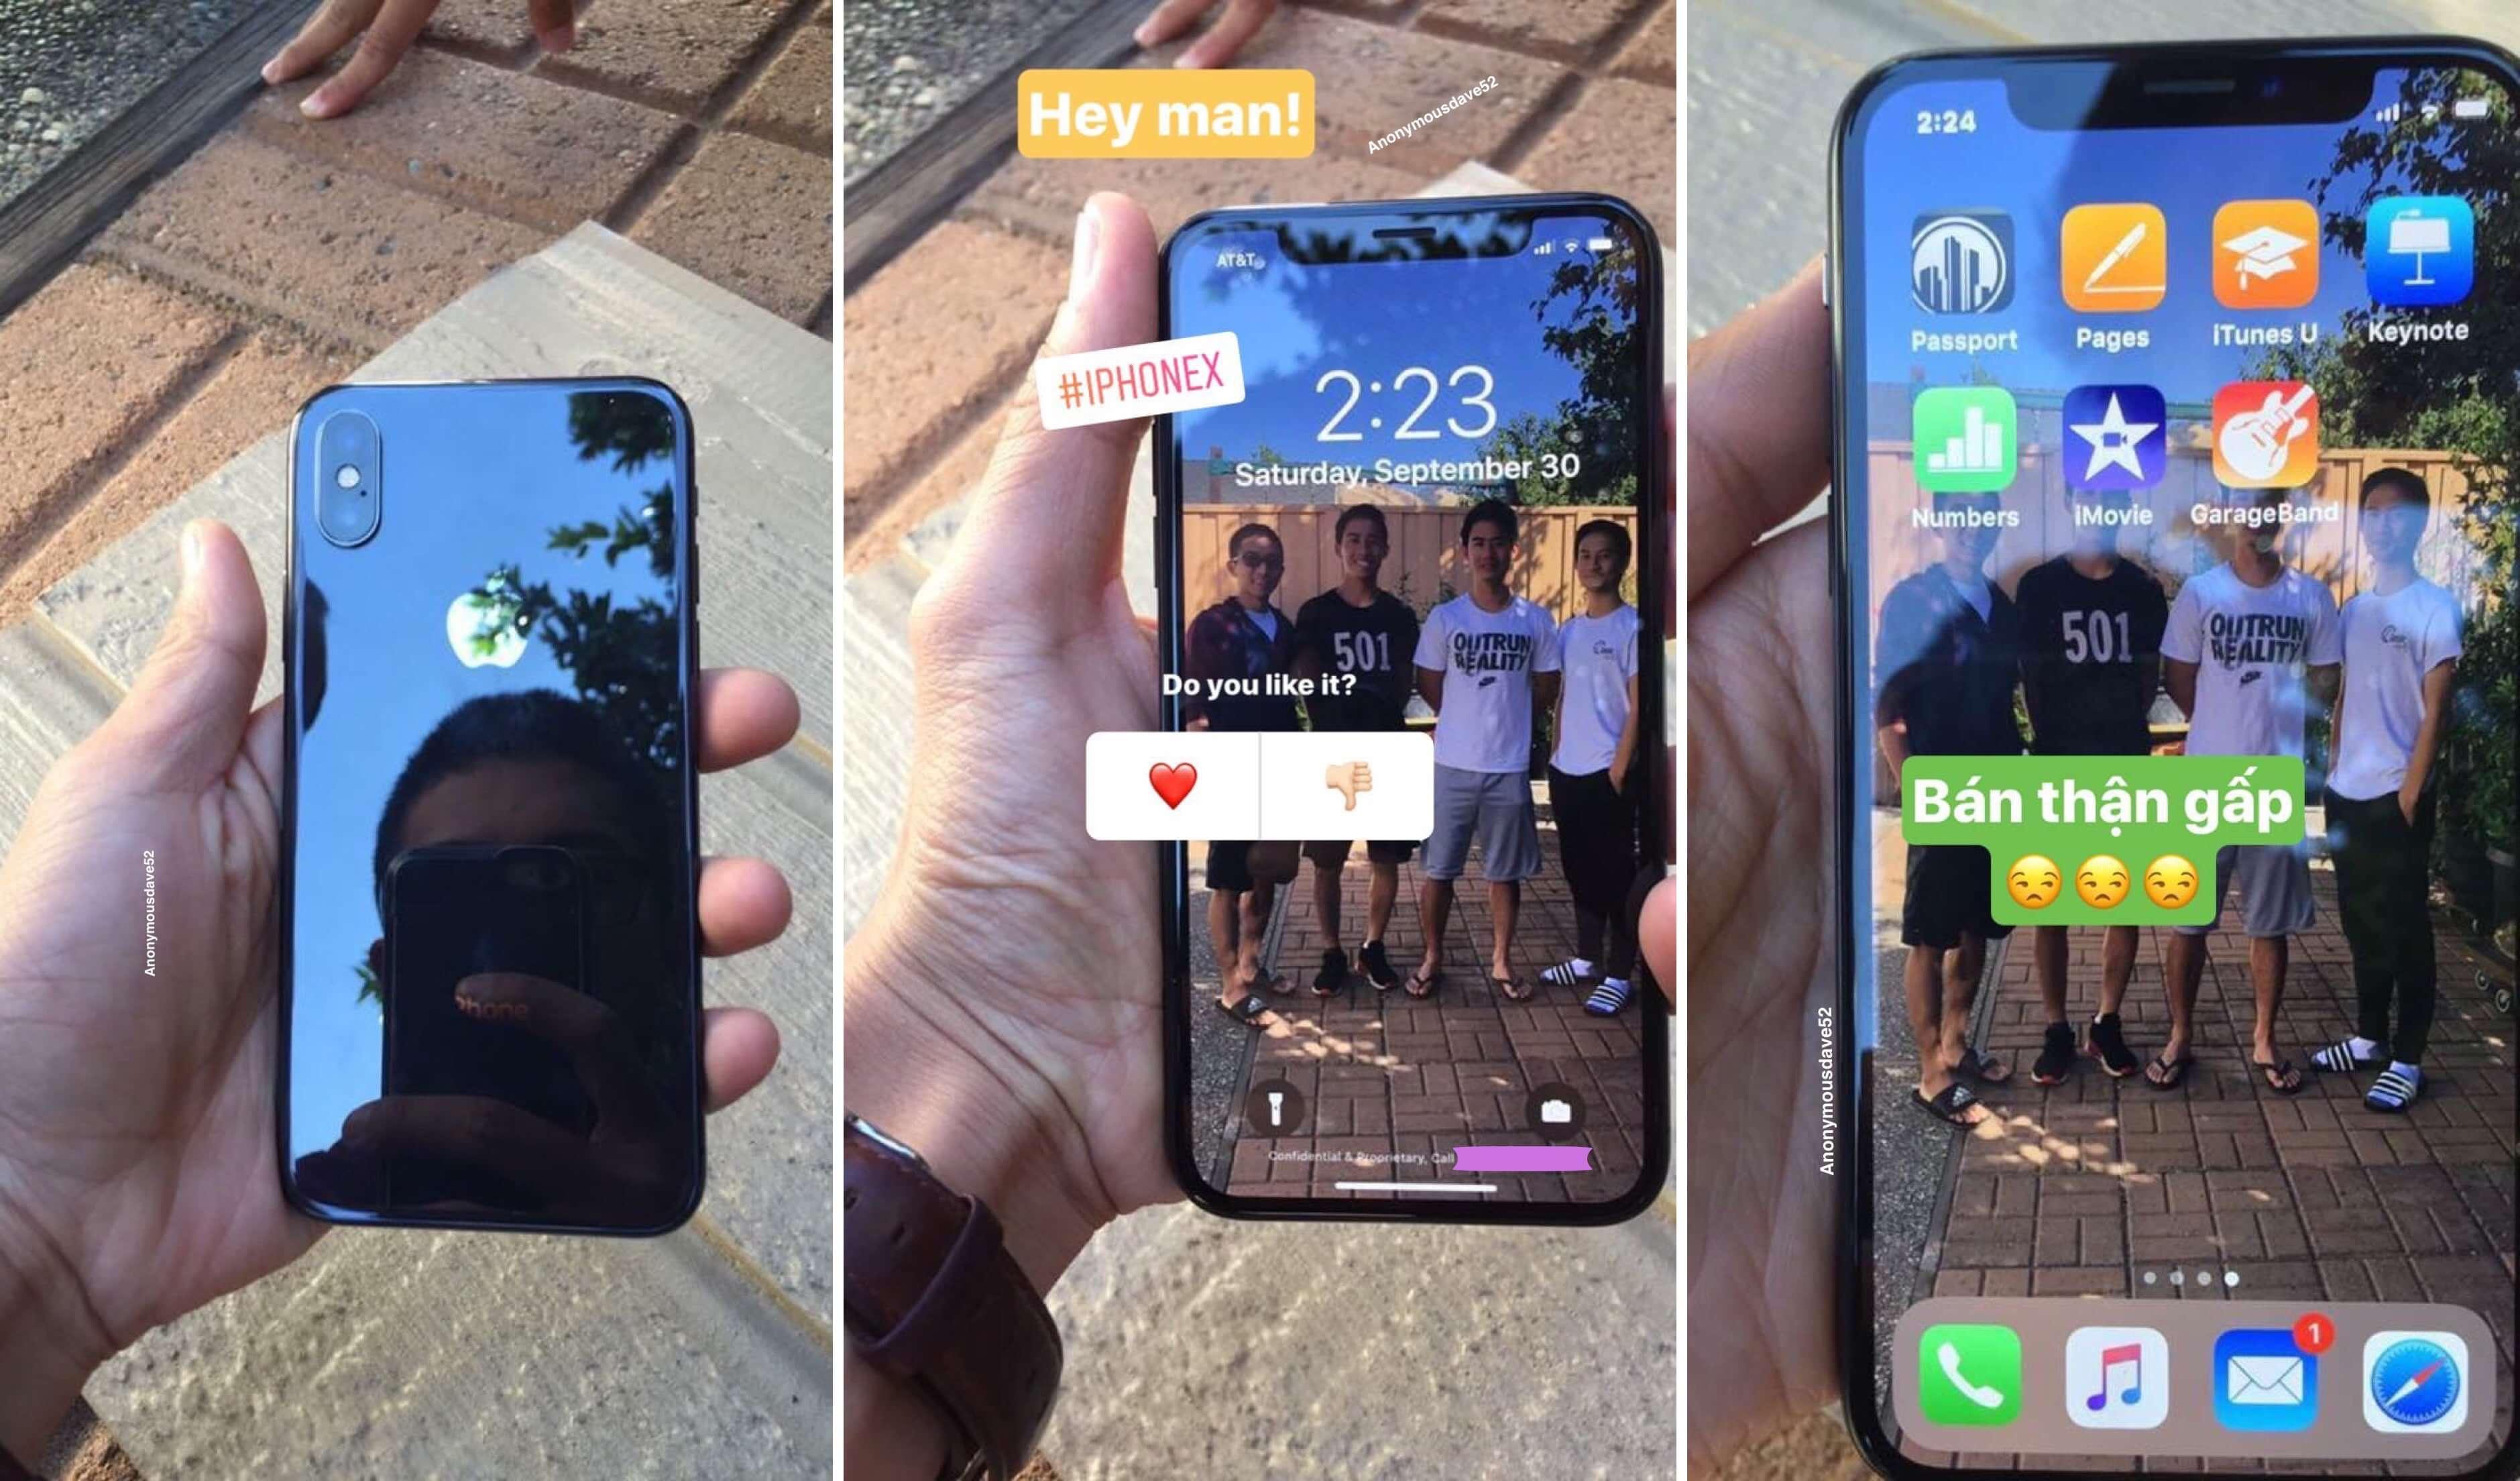 iPhone X 兩款實機提早現身網路